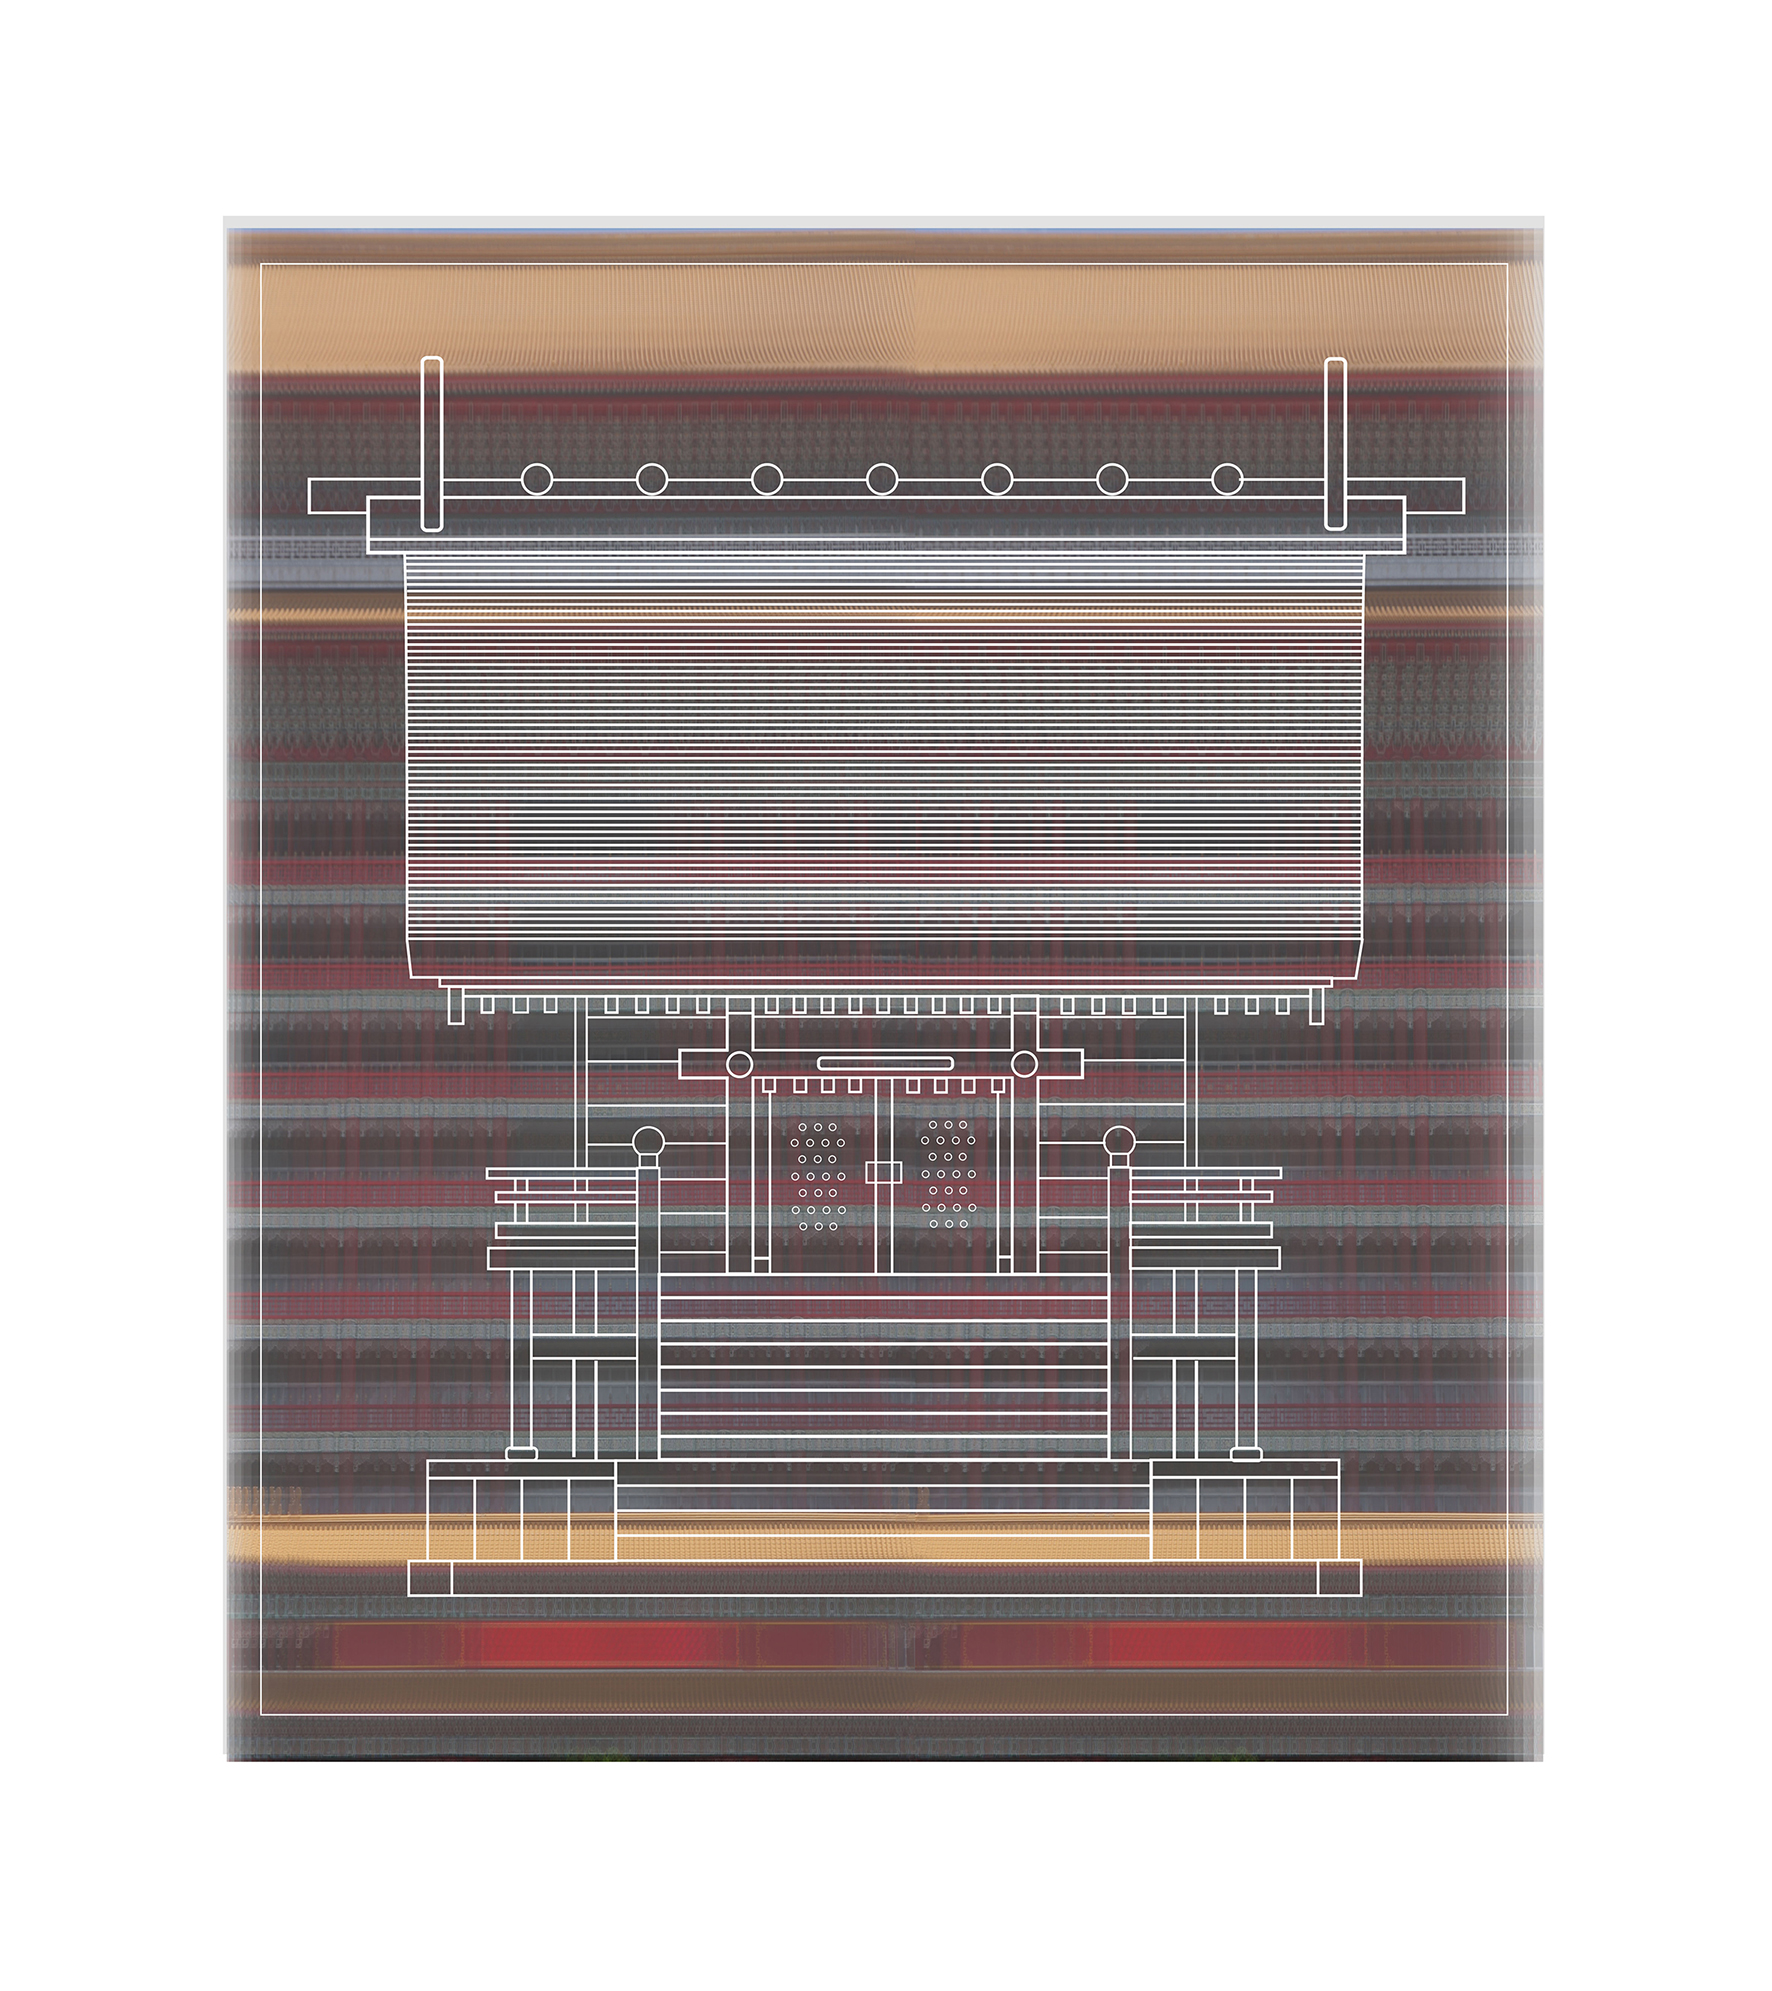 陳飛豪《台灣神宮檔案重構計劃:初代台灣神社與圓山飯店|Reconstruction of Taiwan Grand Shrine archives The first-generation Taiwa